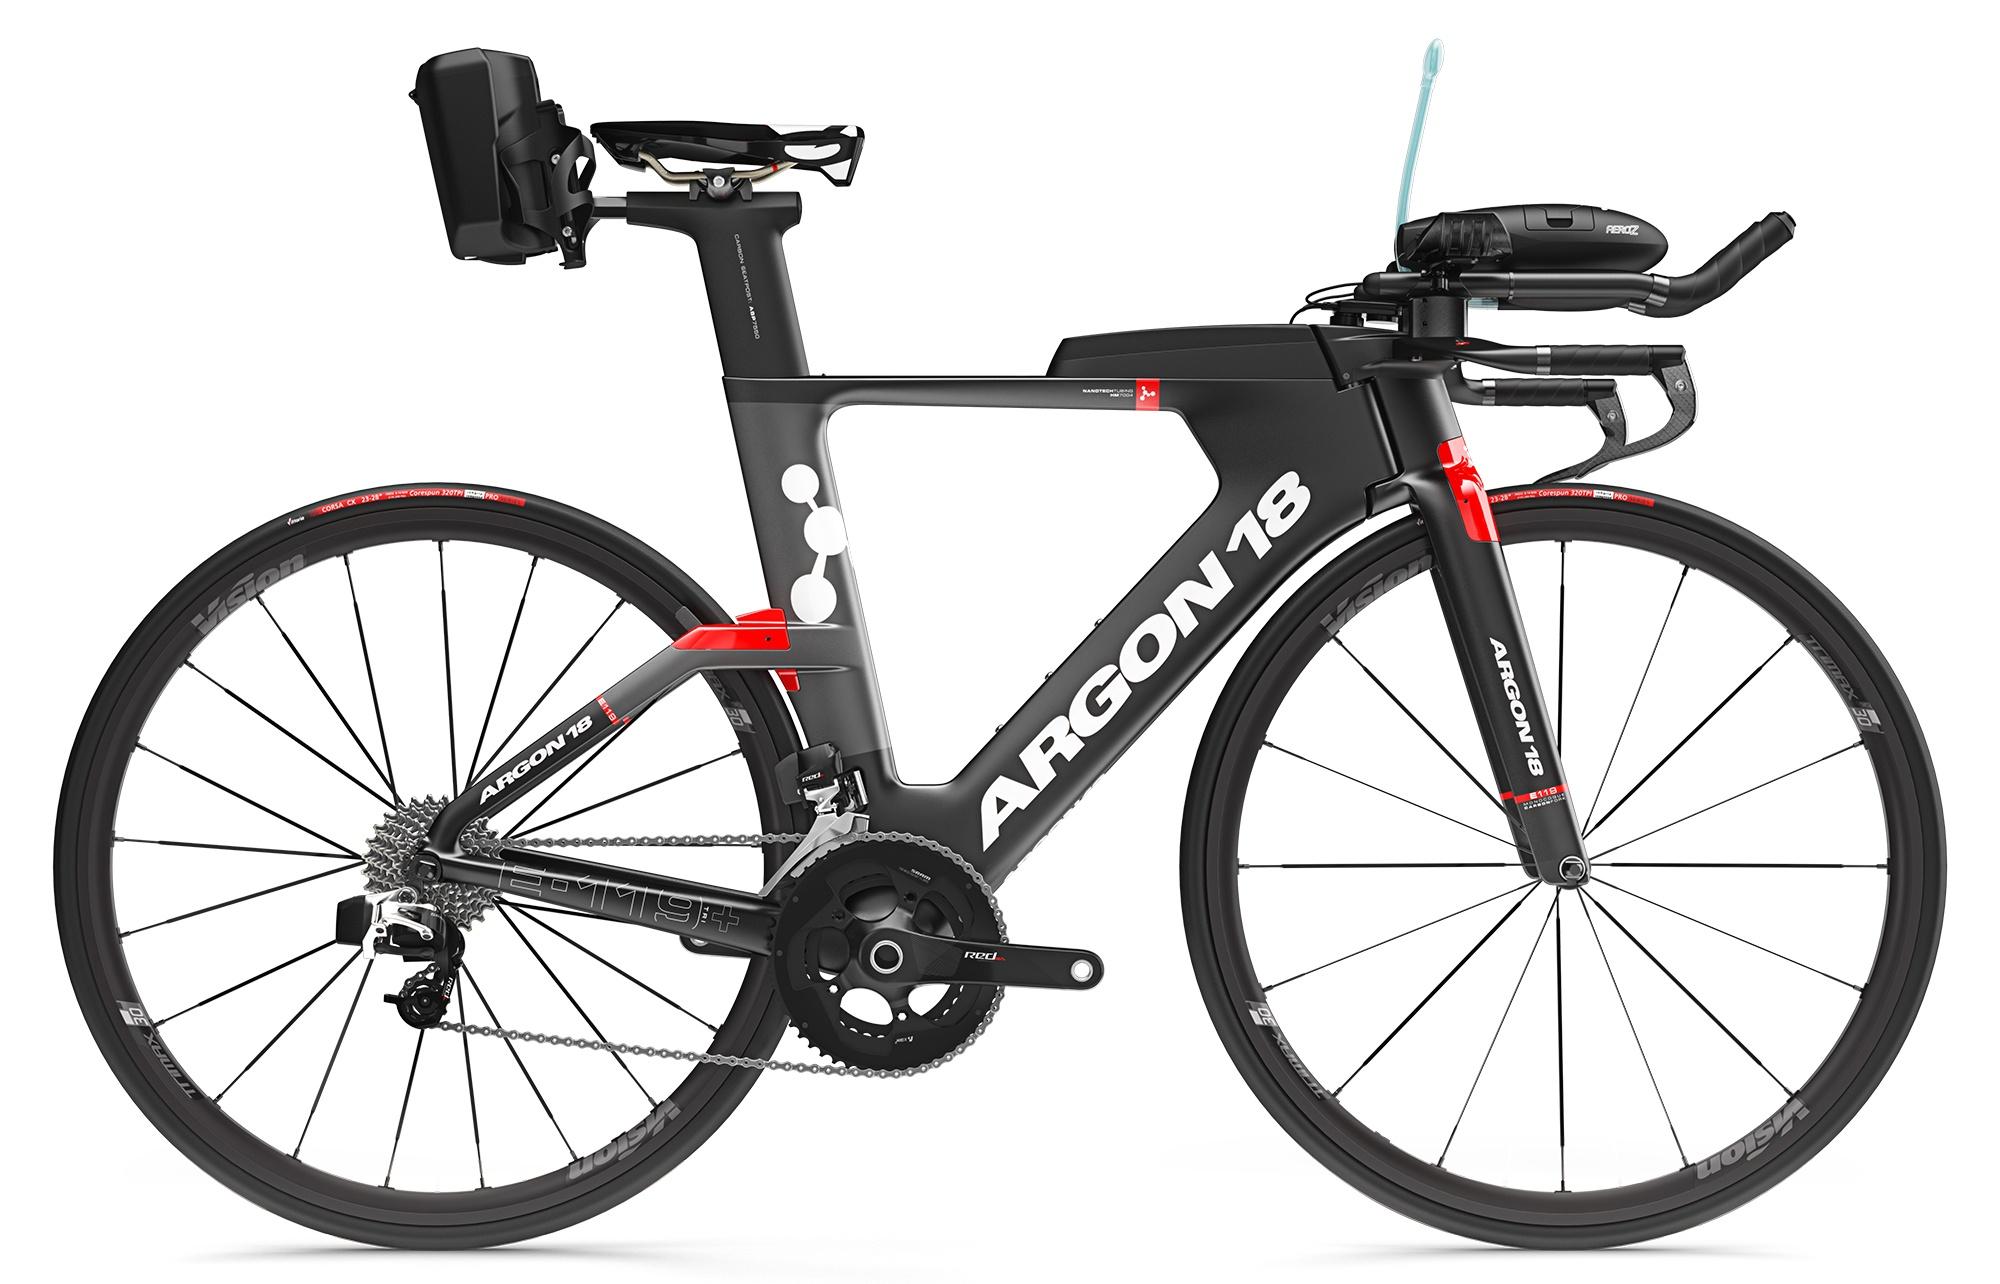 86070b78f5f 2018 Argon 18 E-119 Tri+ eTap Bike | R&A Cycles